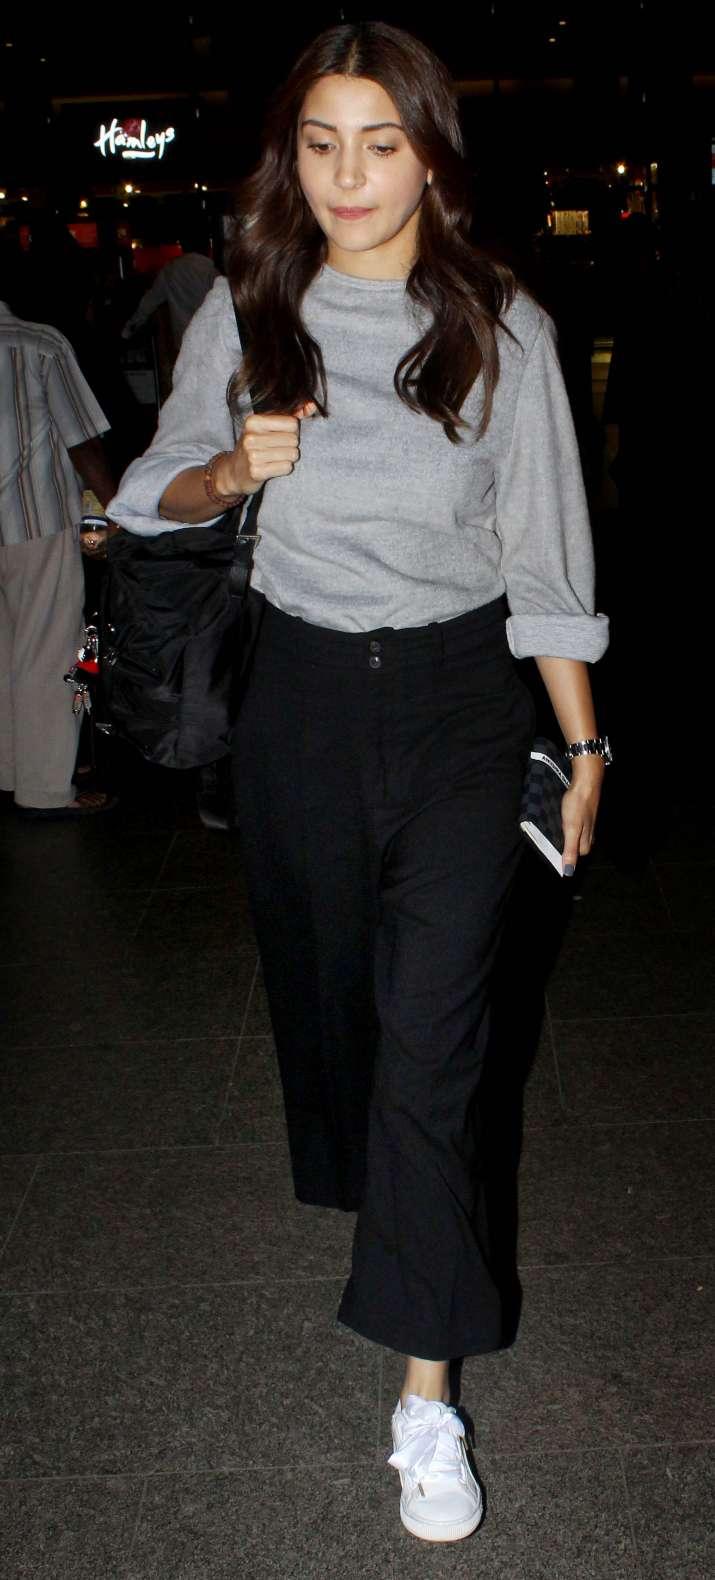 India Tv - Anushka Sharma was wearing agreyloose top with black casual pants.